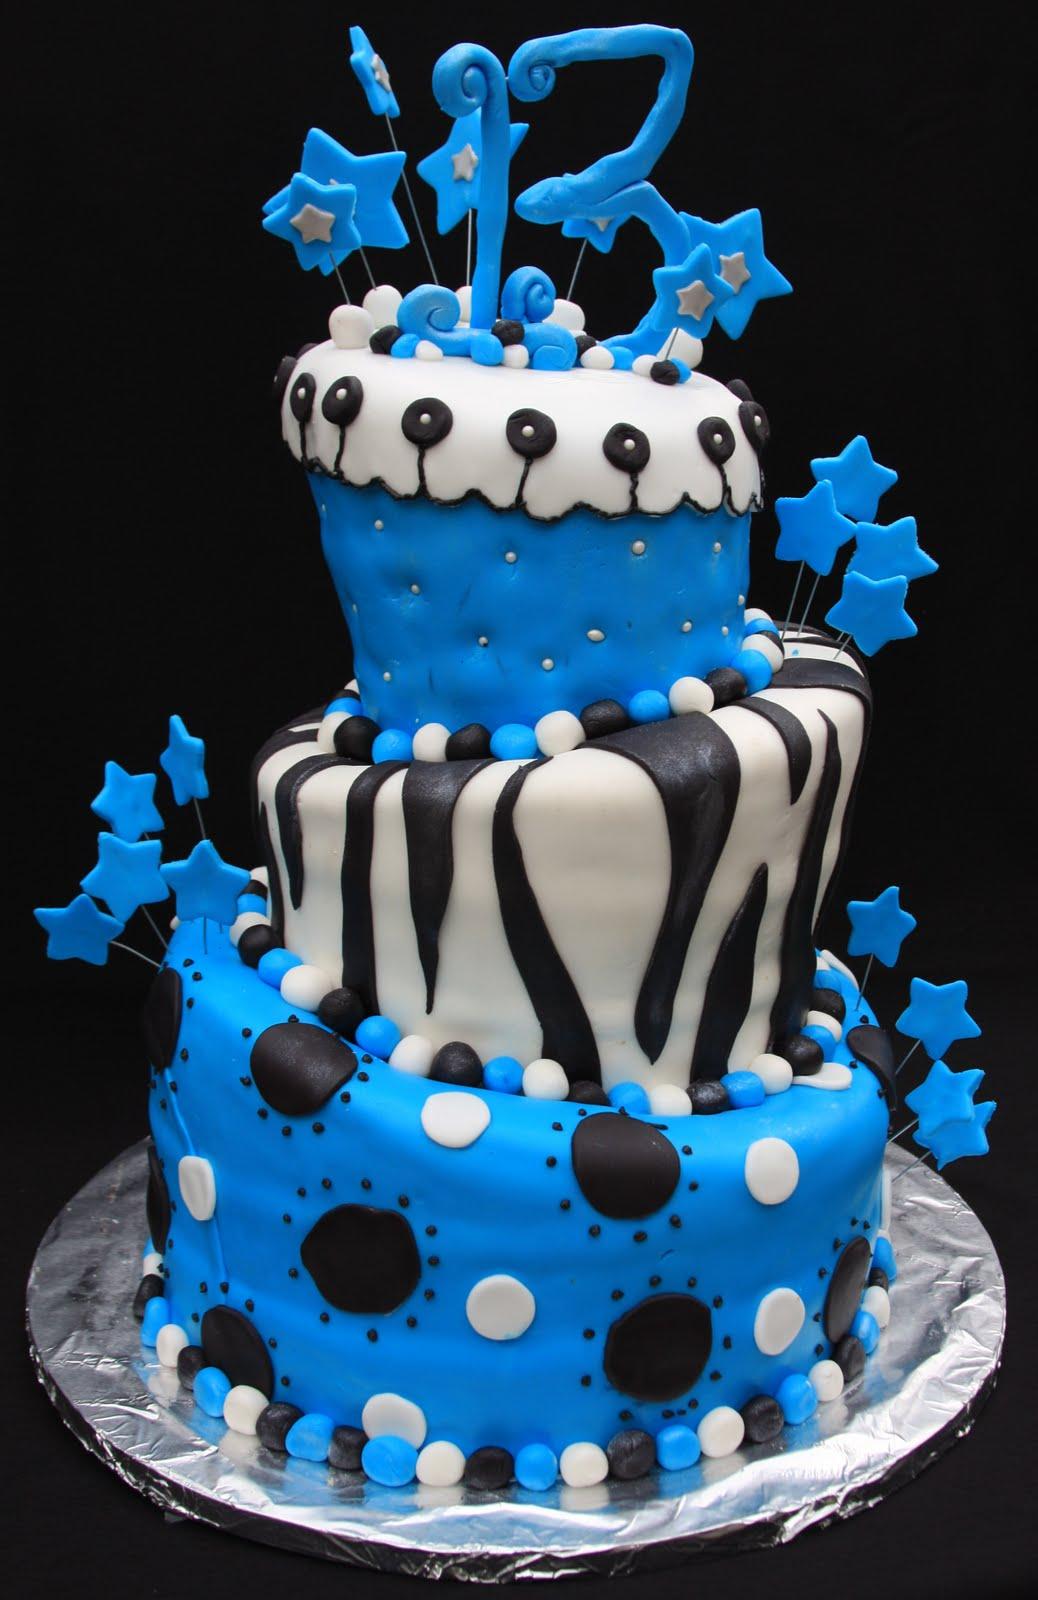 Robins Amazing Cakes A Topsy Turvy Birthday